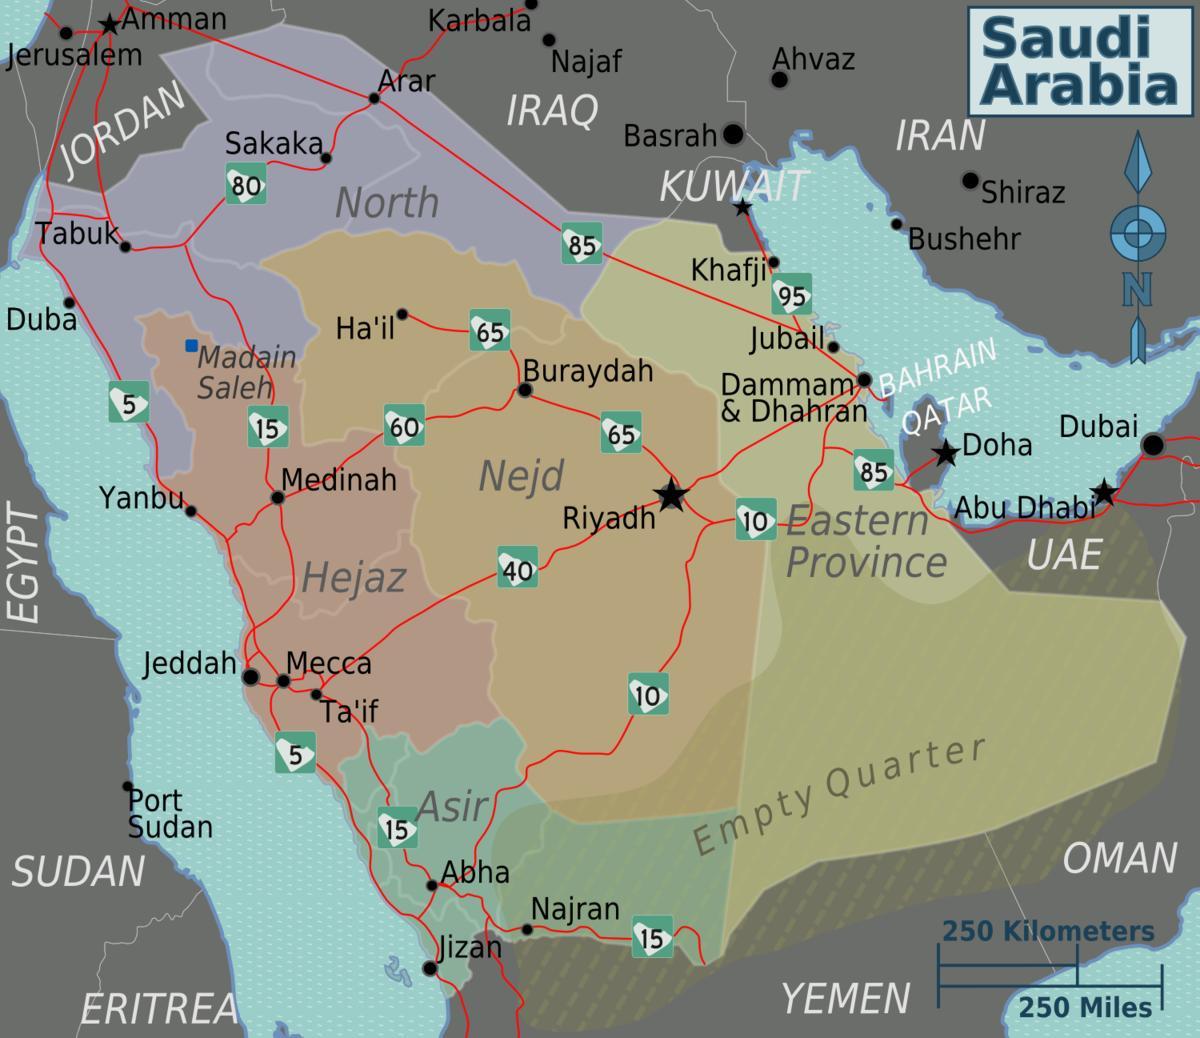 Map of Saudi Arabia with cities distance - Map of Saudi